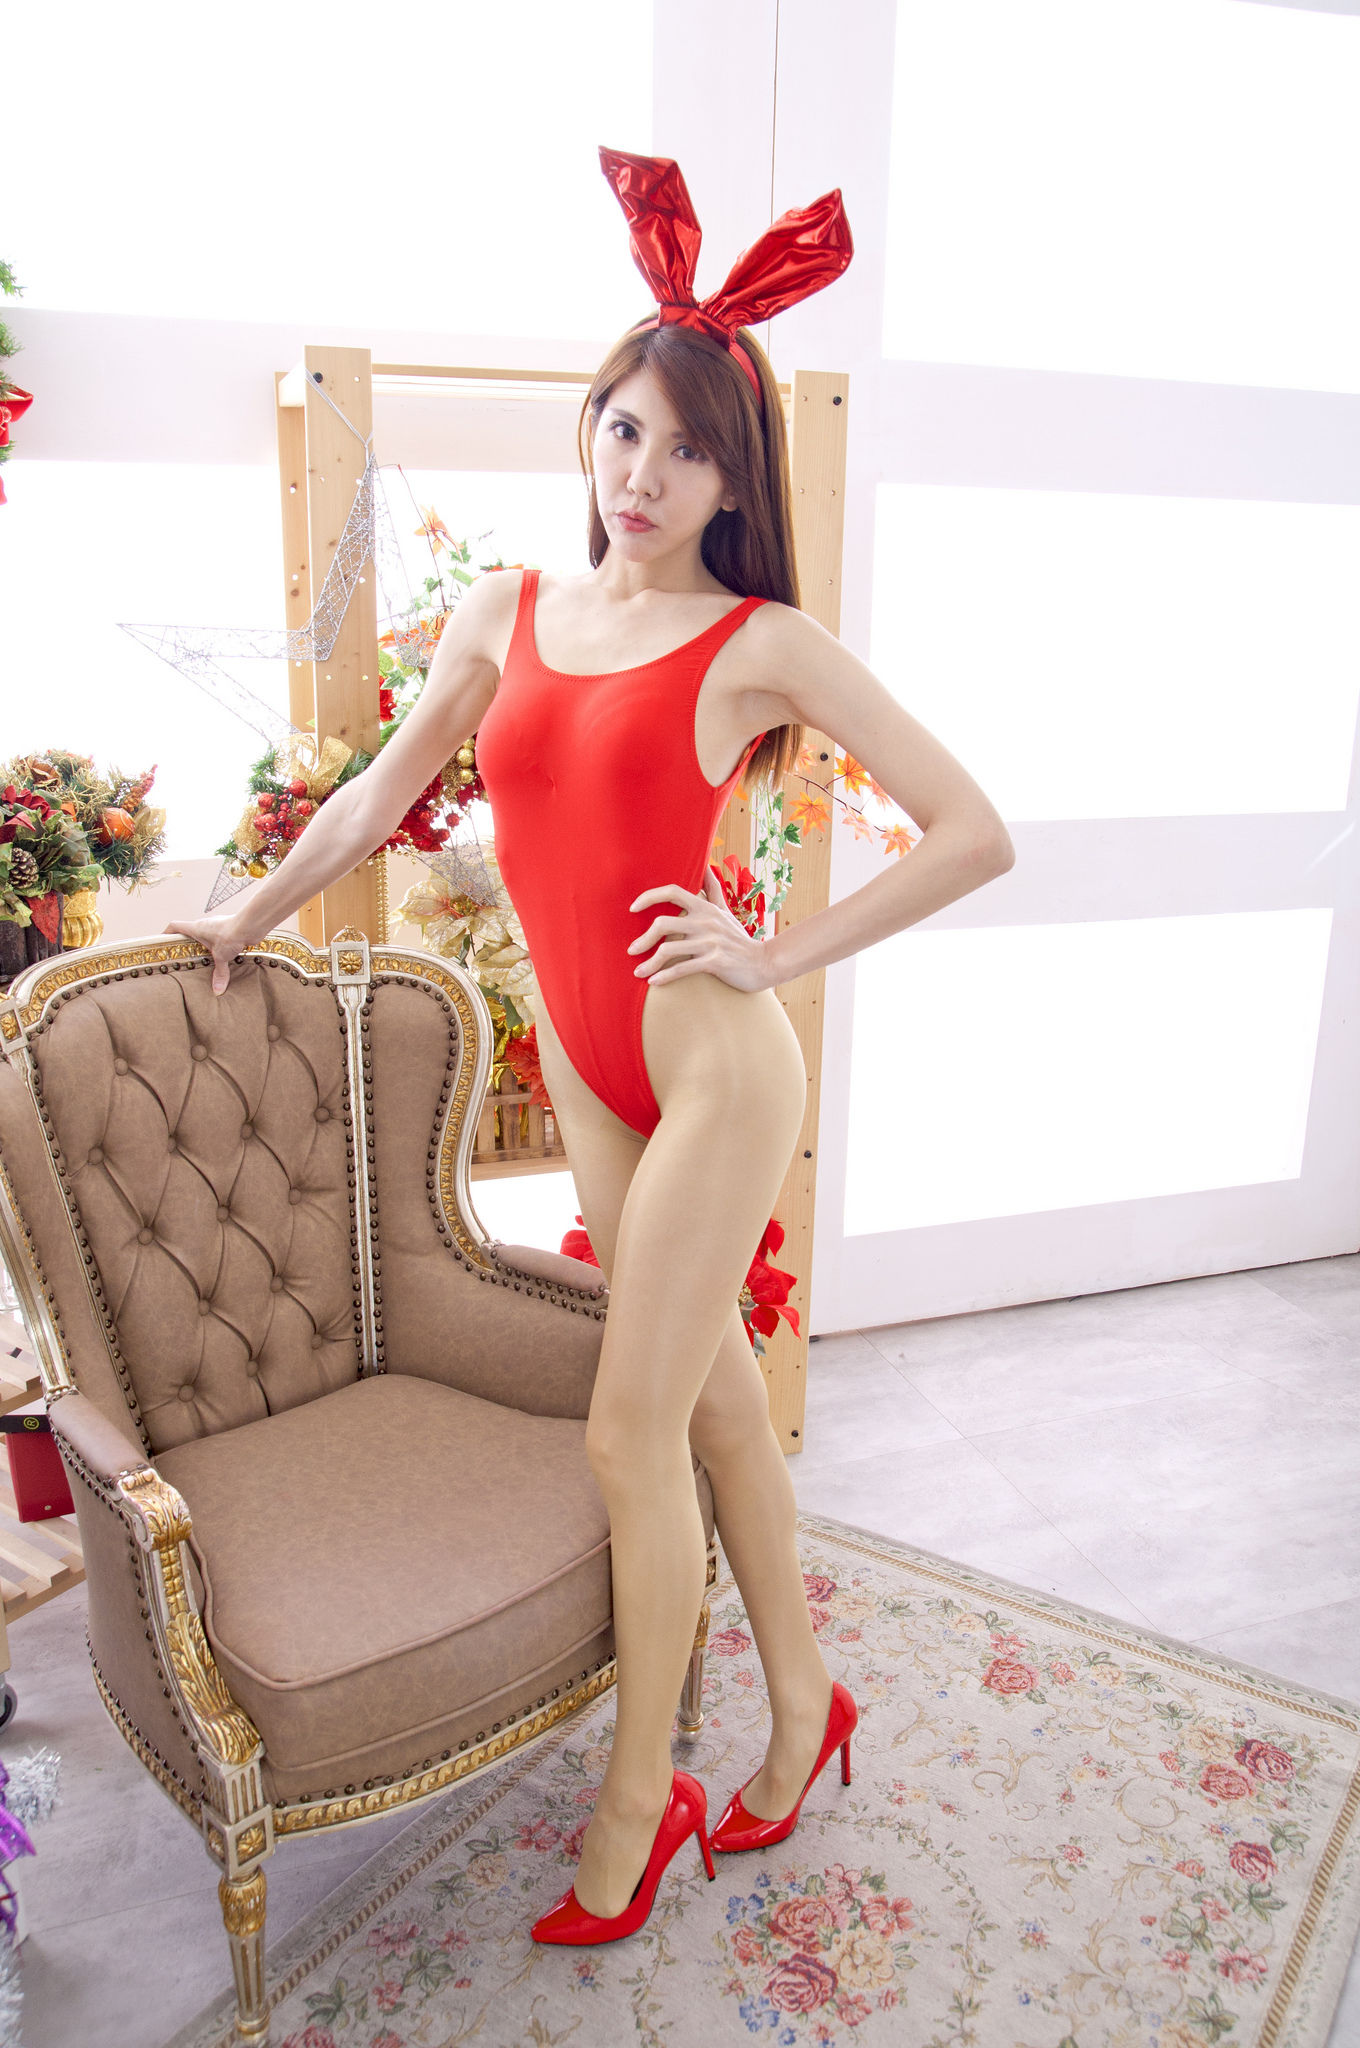 VOL.1814 [台湾正妹]兔女郎圣诞:黄淑华(腿模Maggie)超高清个人性感漂亮大图(40P)